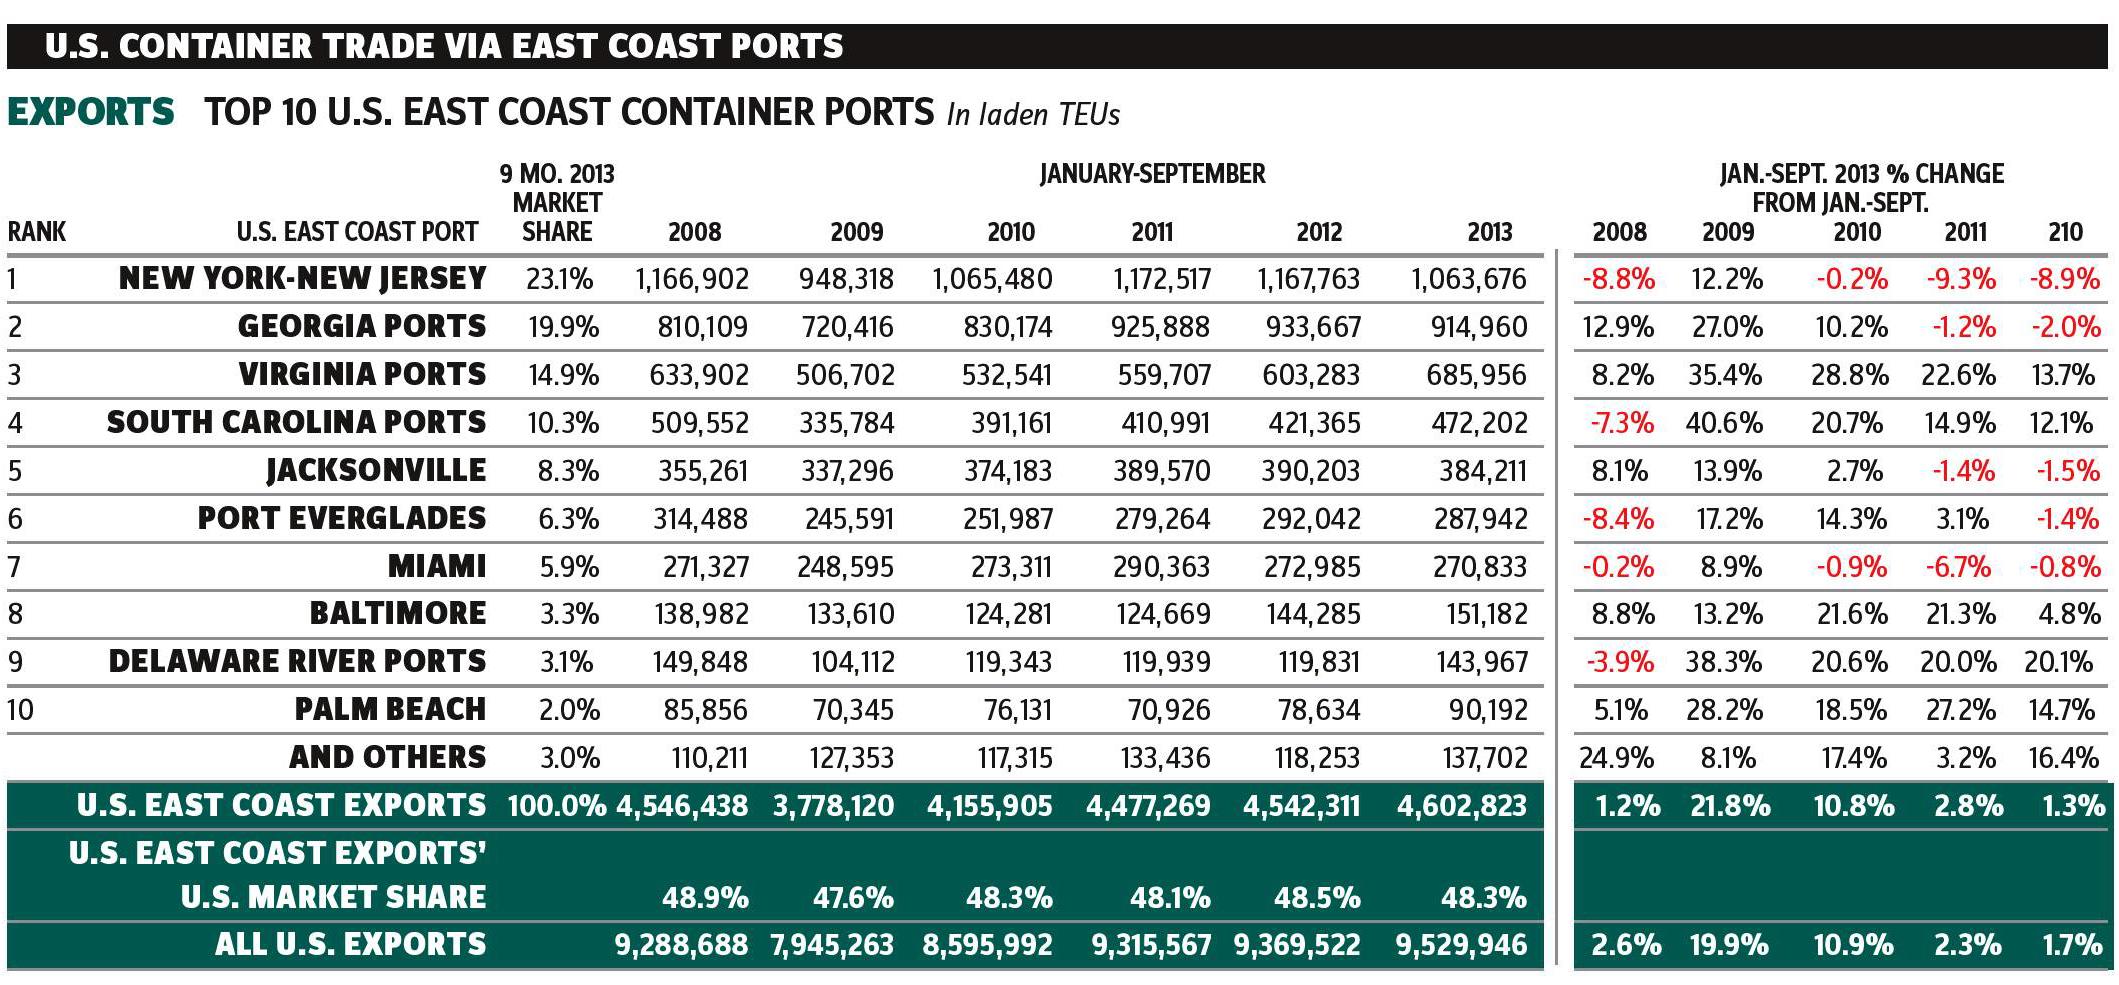 U.S._Container_Trade_Via_East_Coast_Ports-Exports